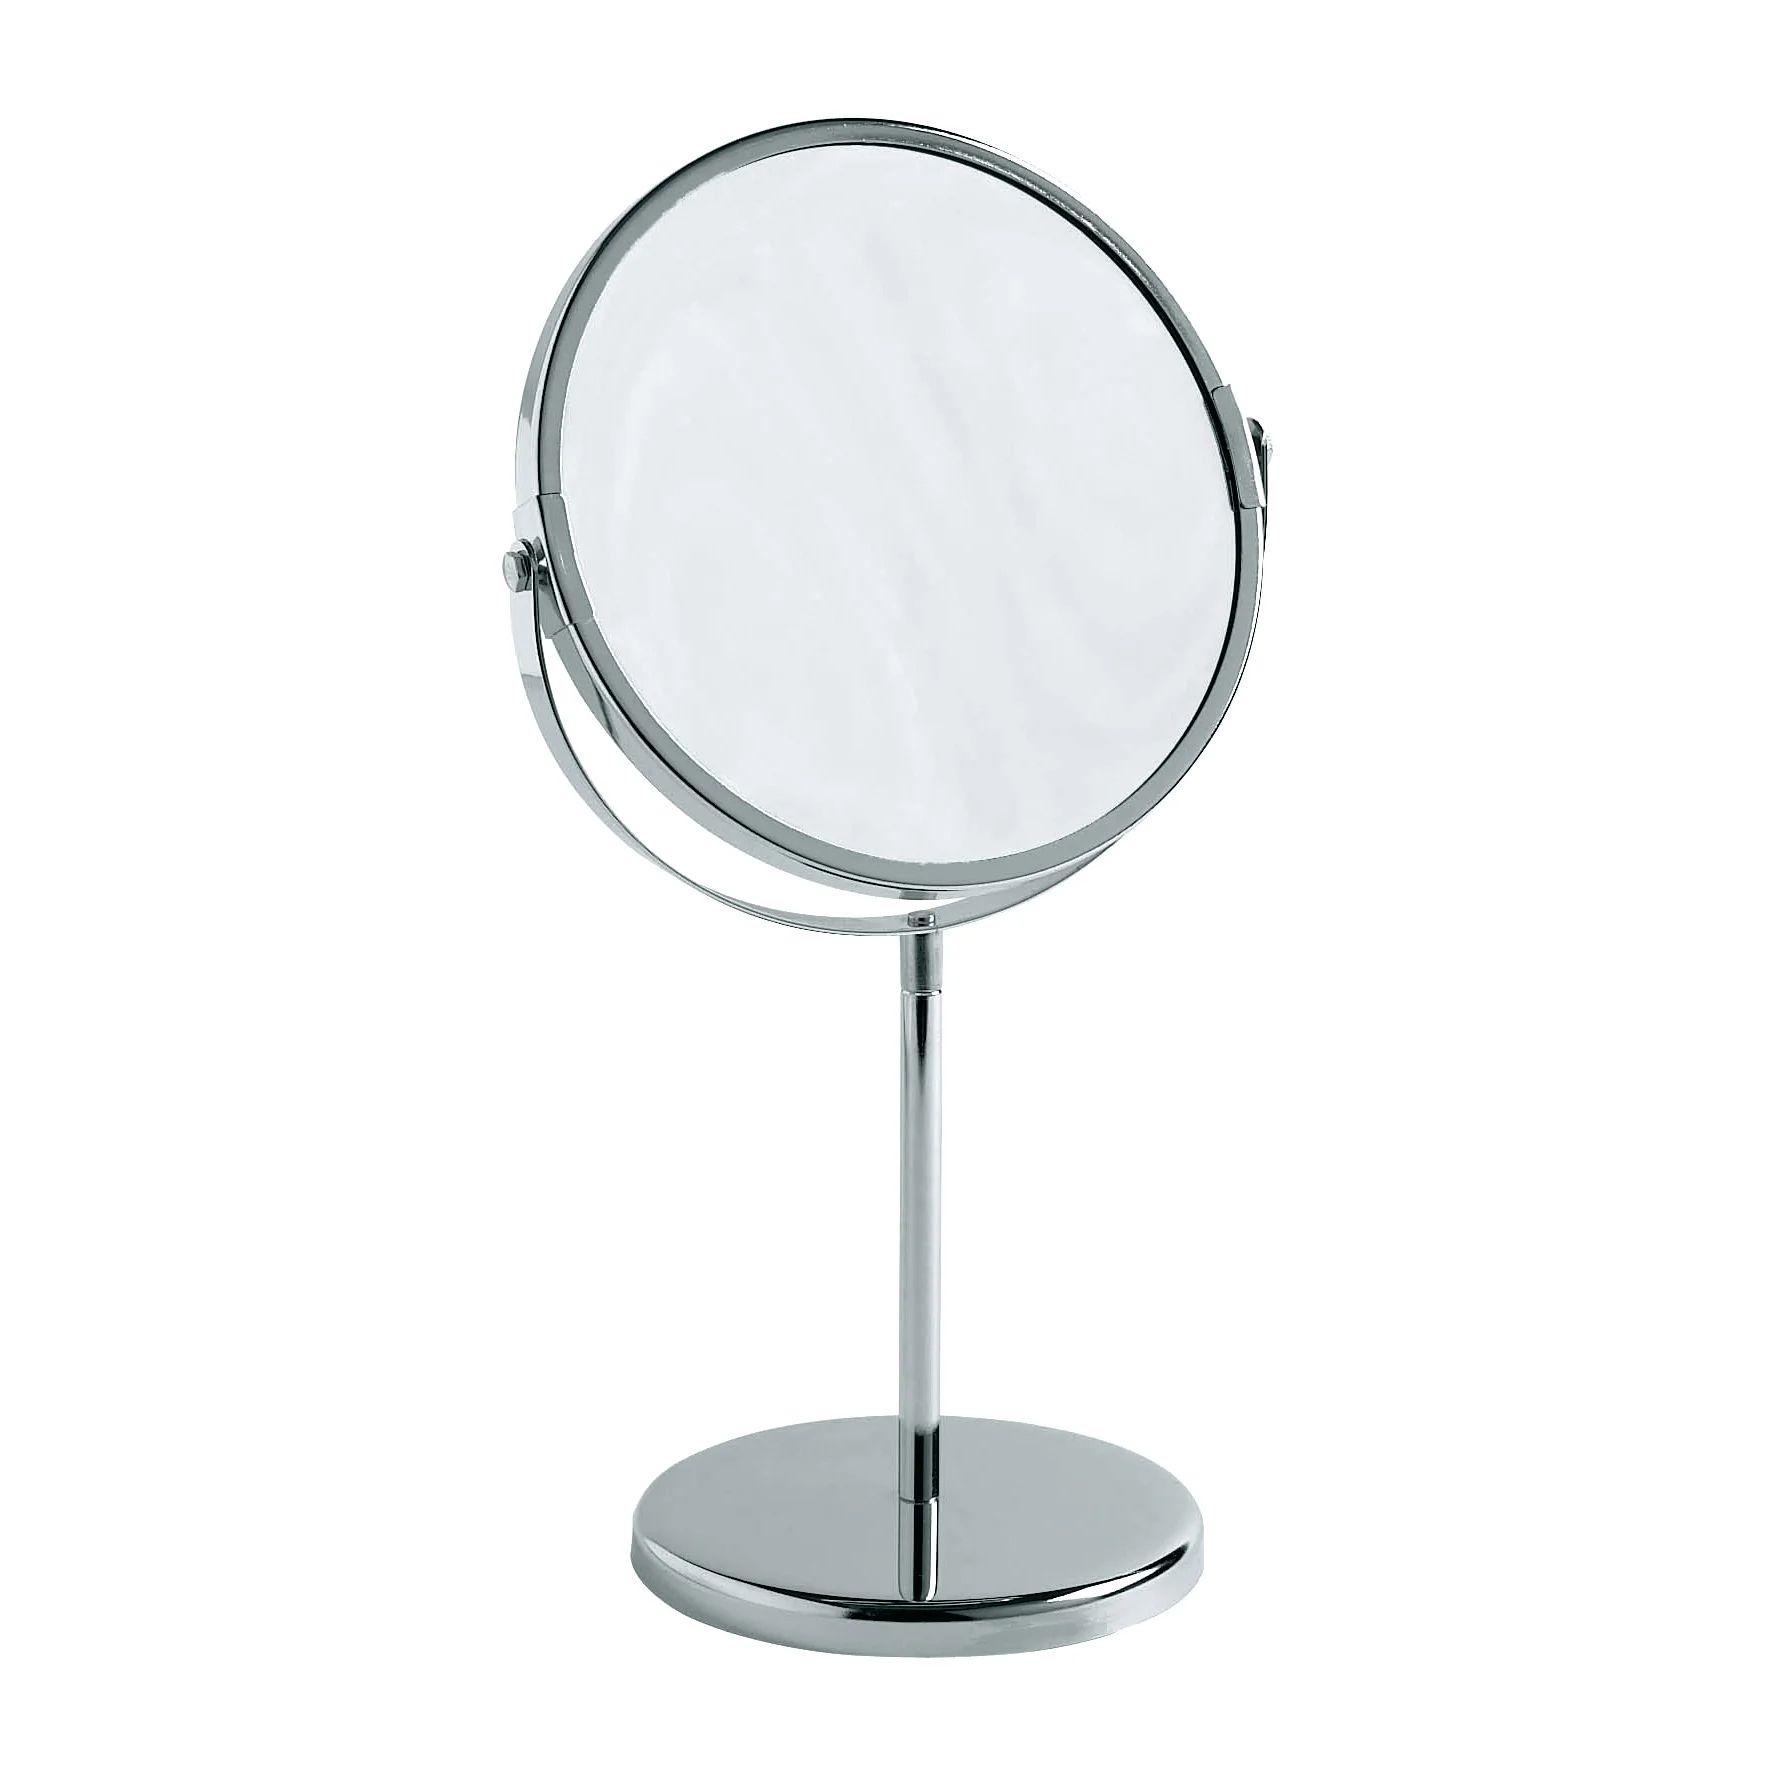 Miroir Grossissant X 3 Rond A Poser H 17 X L 17 X P 17 Cm Design Leroy Merlin